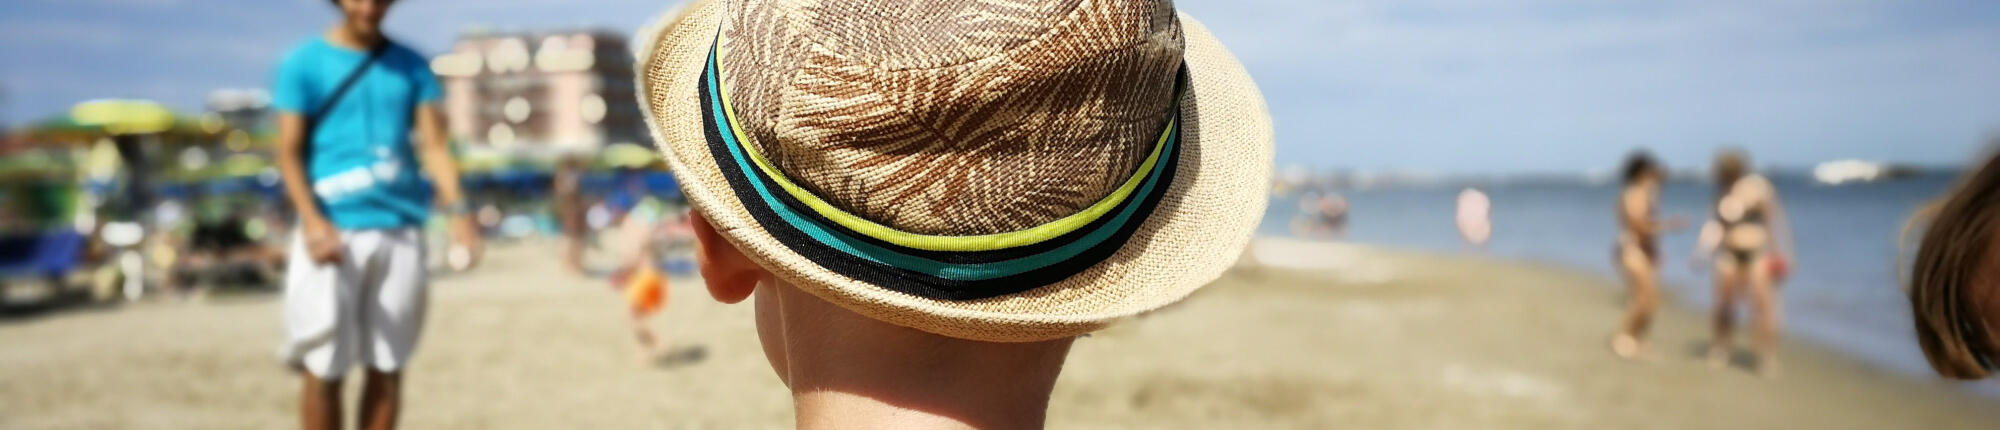 Super offerta vacanze di luglio a Rimini